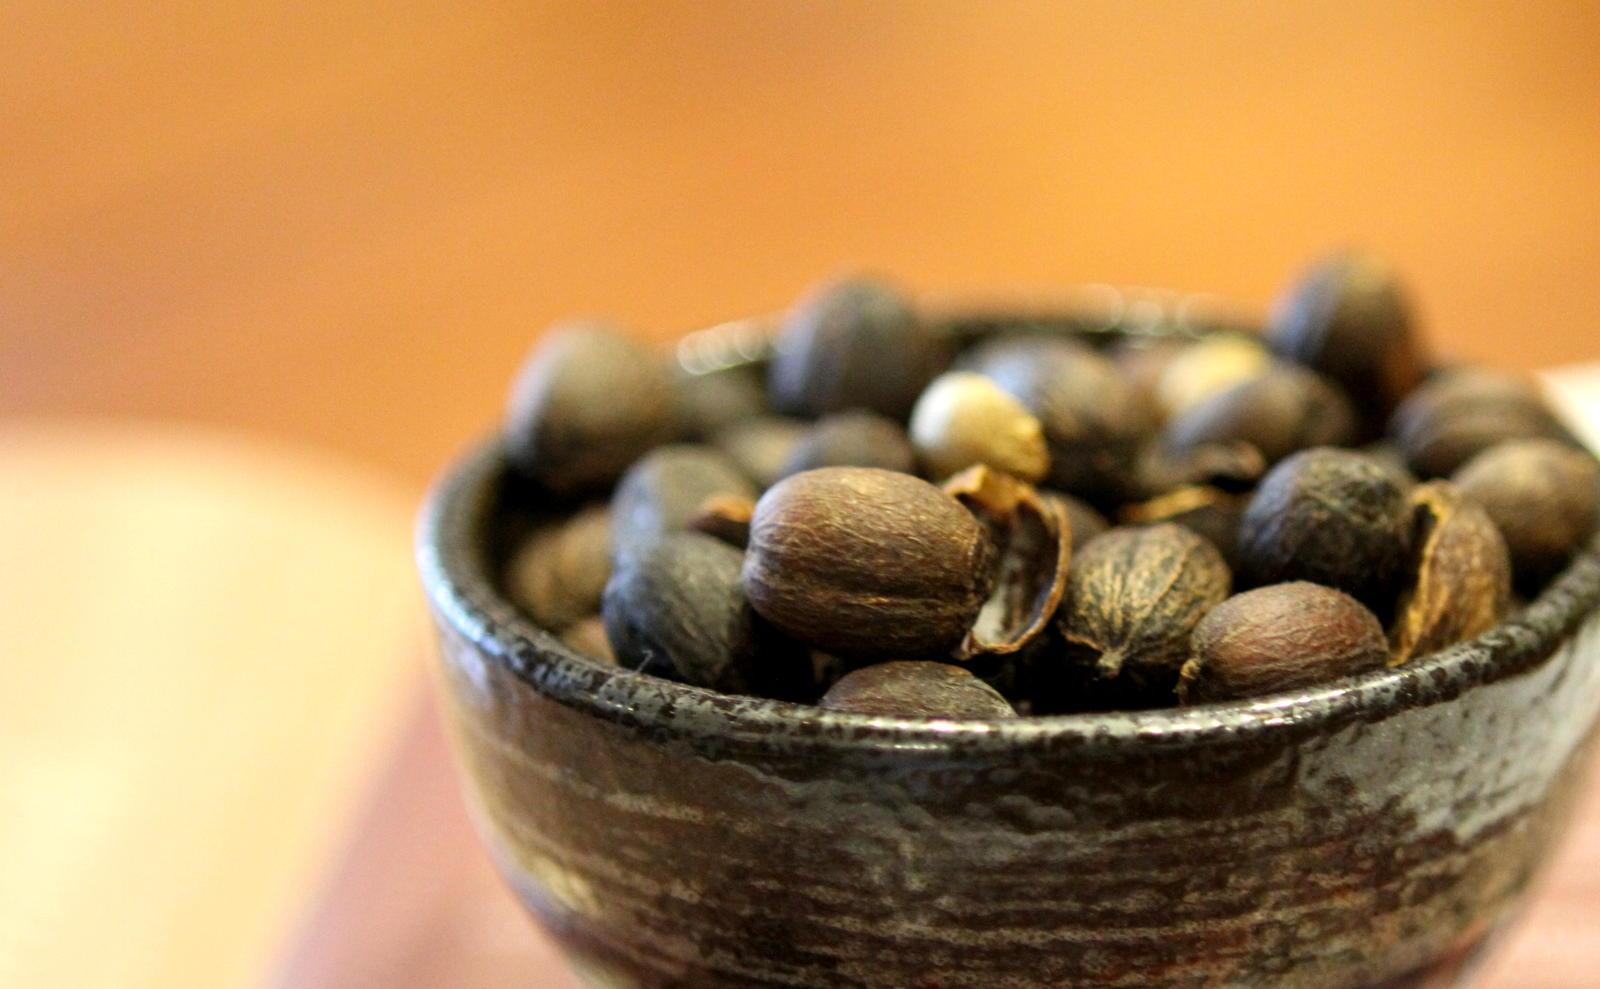 Coffee cherries dry